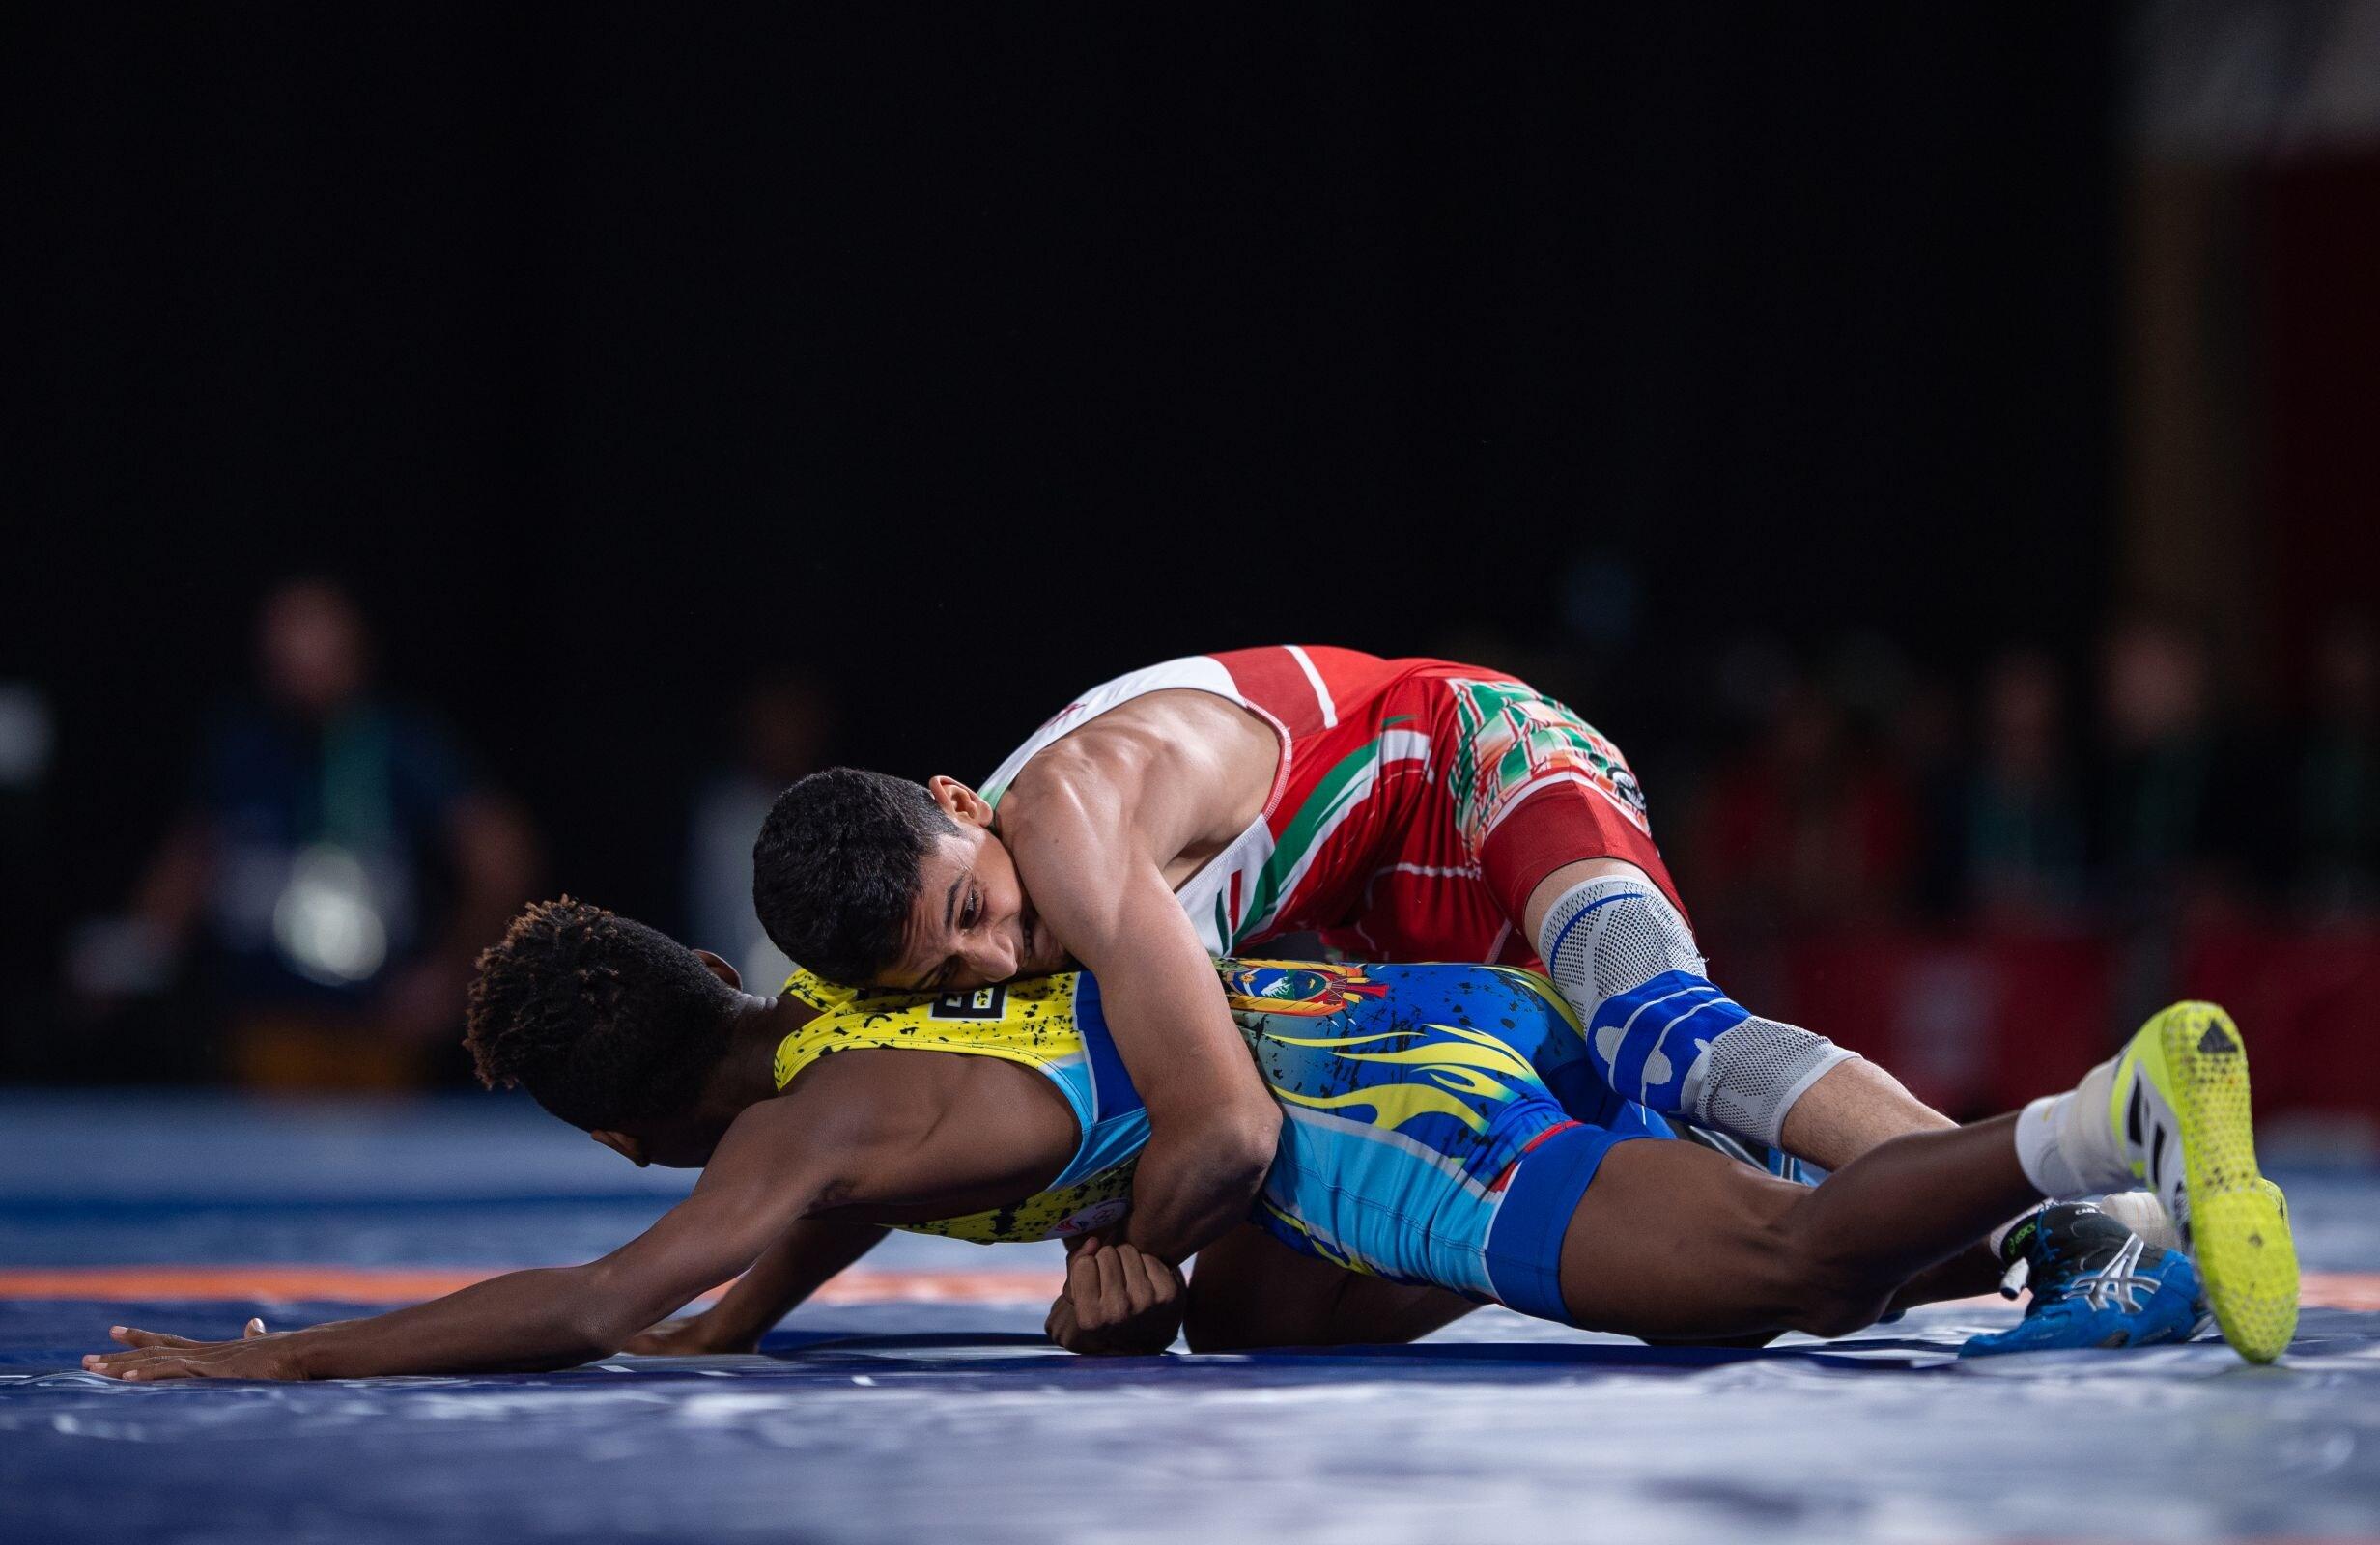 Buenos Aires 2018 - Wrestling Greco-Roman - Men's 45kg